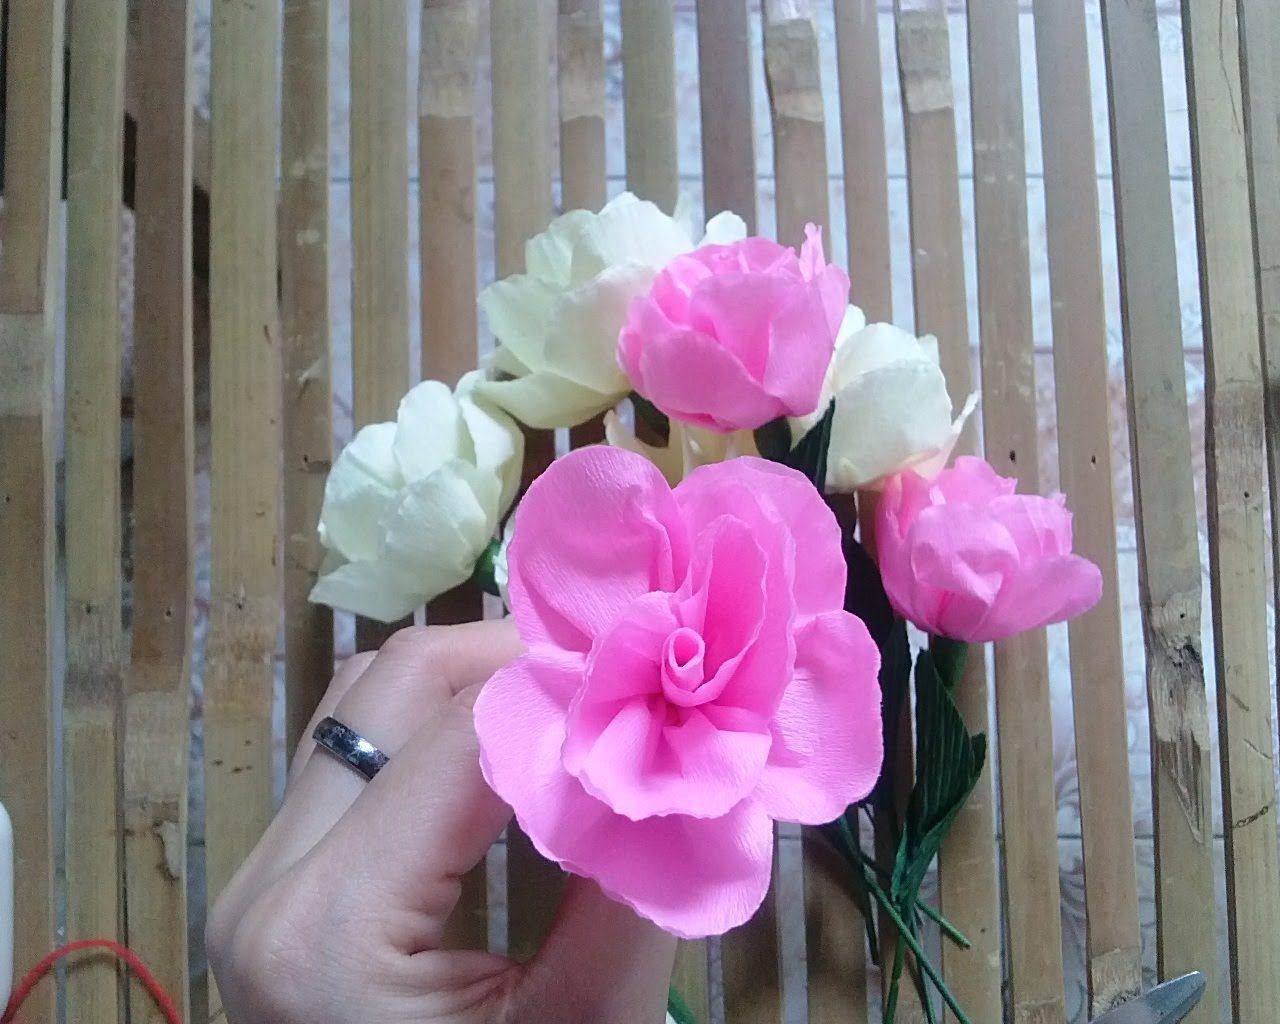 Miniature Rose Paper Flower Tutorial Hng Dn Lm Hoa Hng T